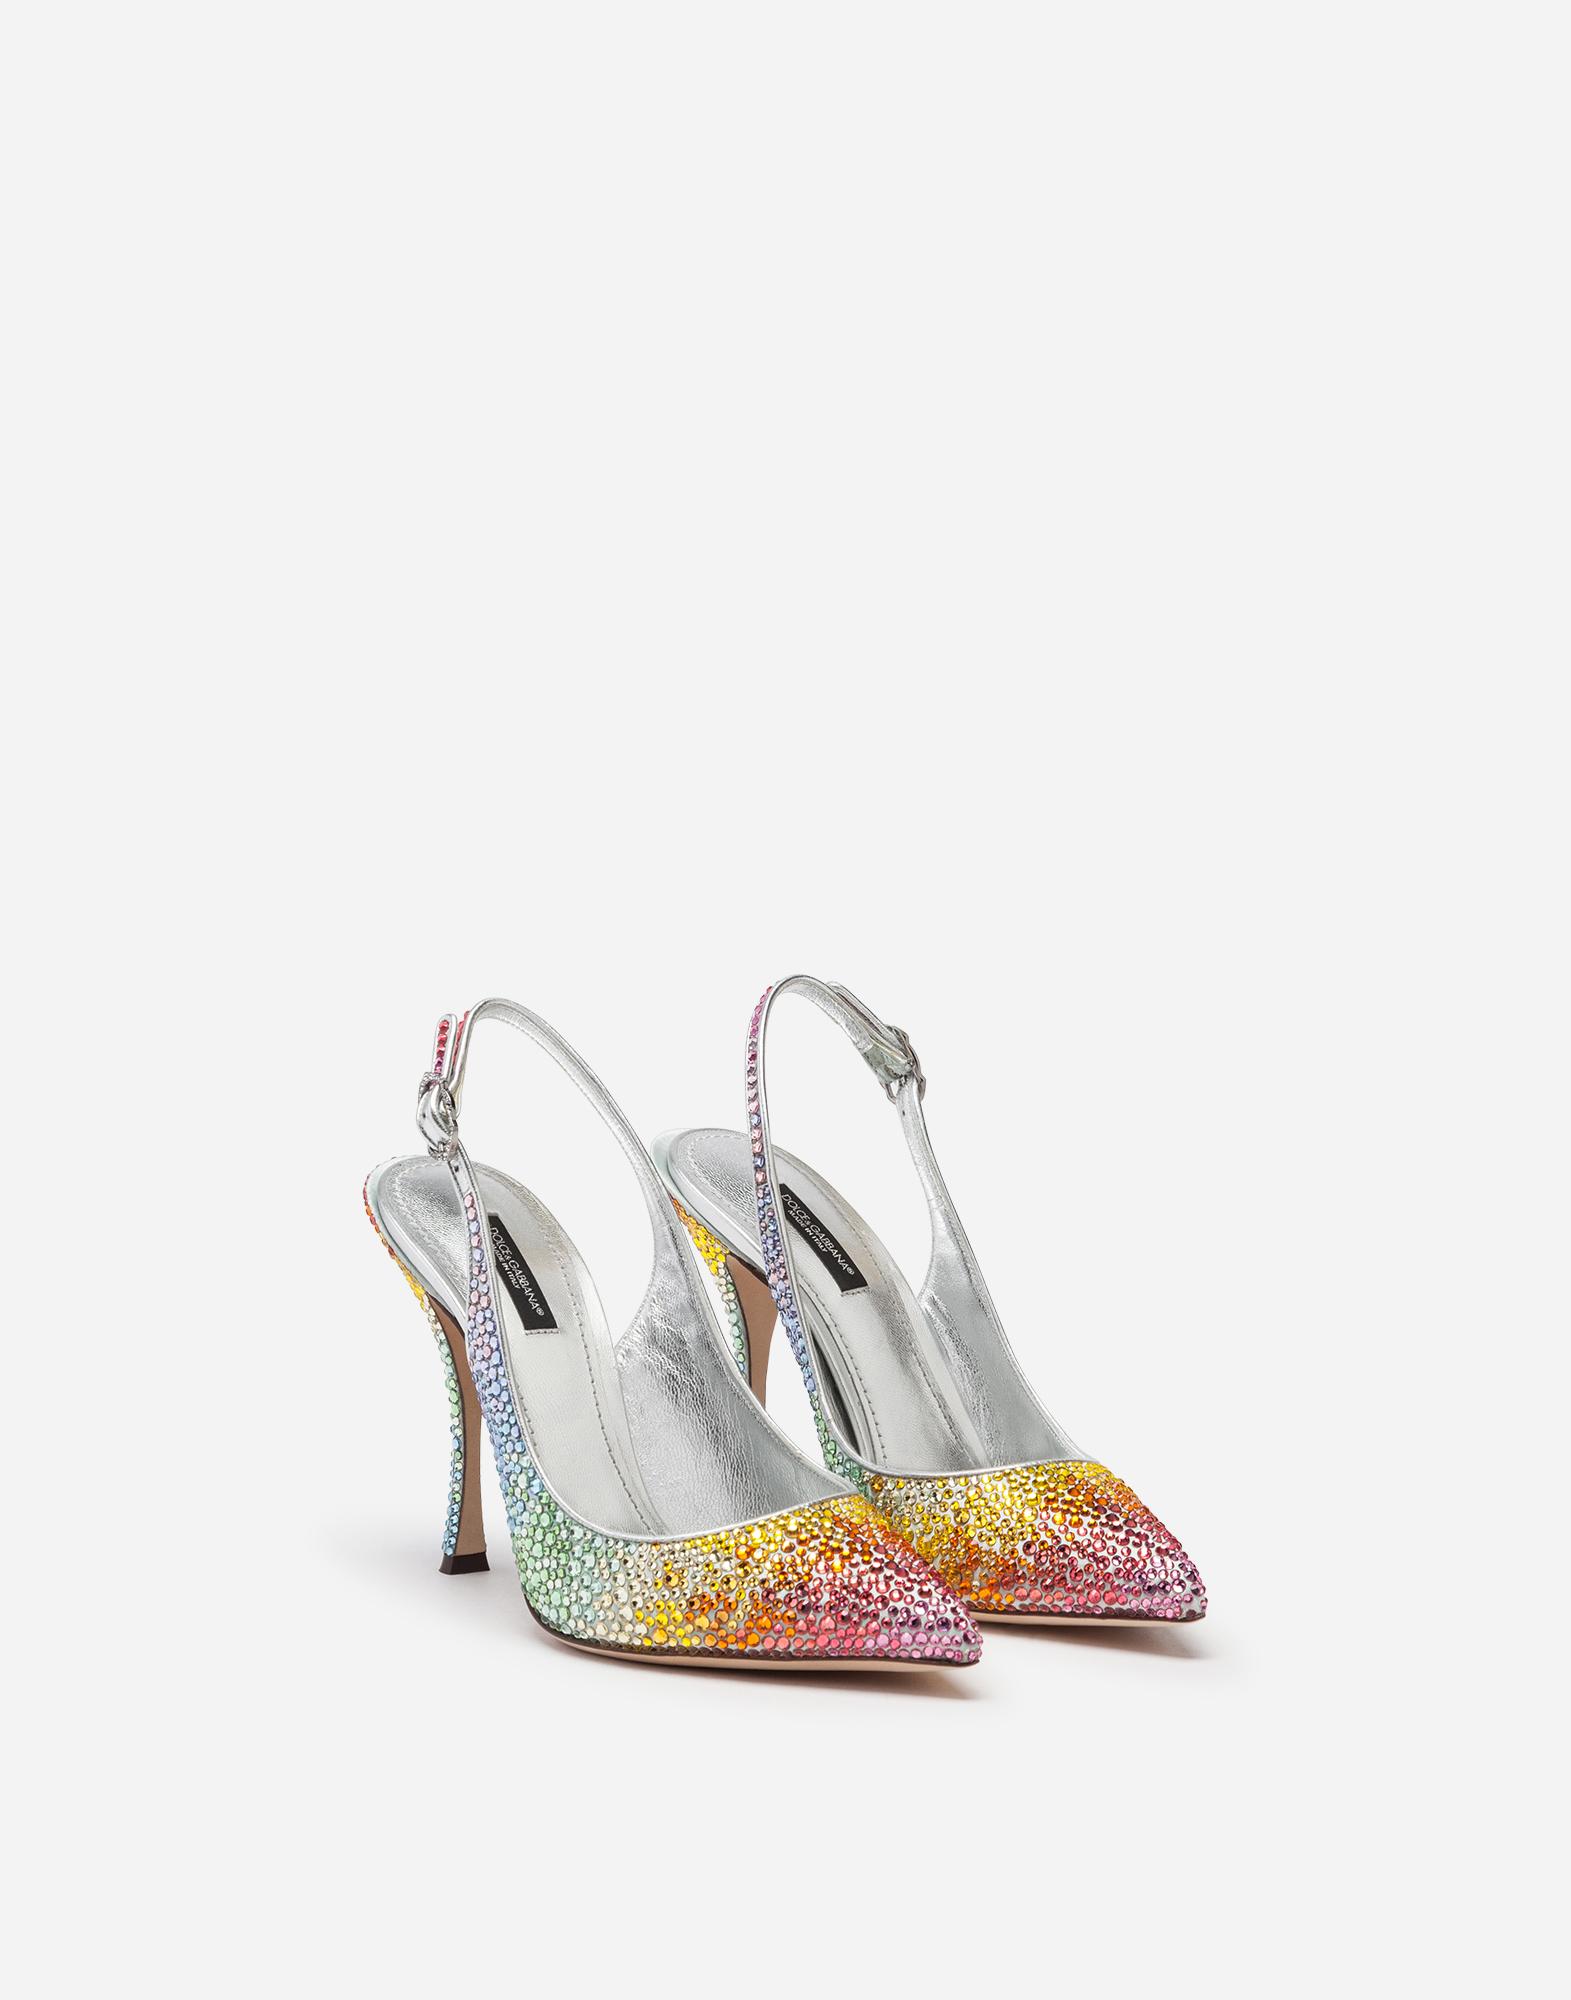 Dolce & Gabbana SLING BACKS IN SATIN AND CRYSTAL